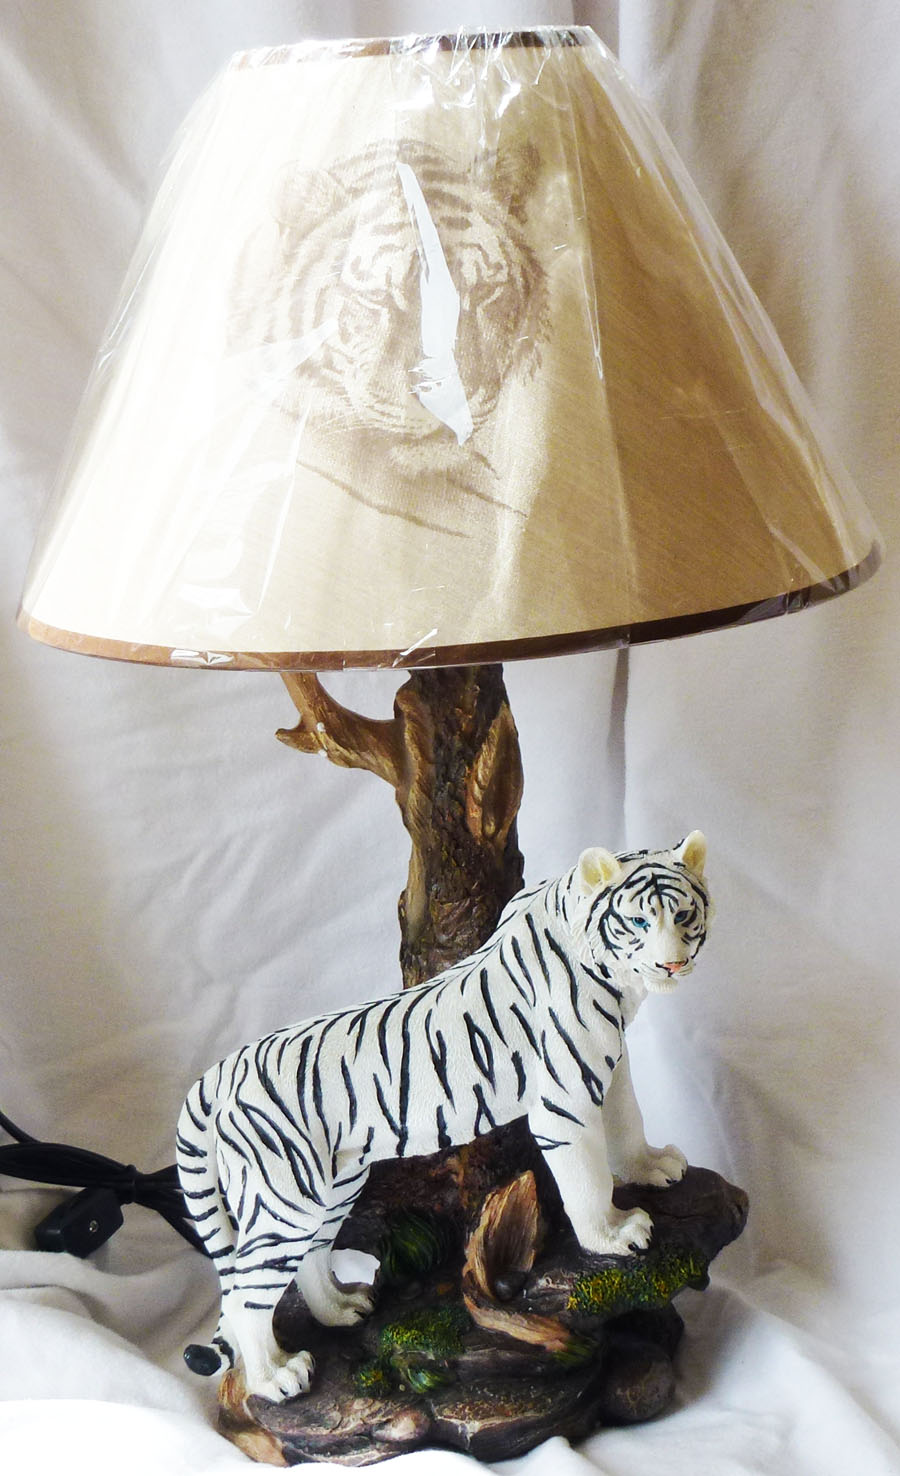 tiger lamp photo - 6